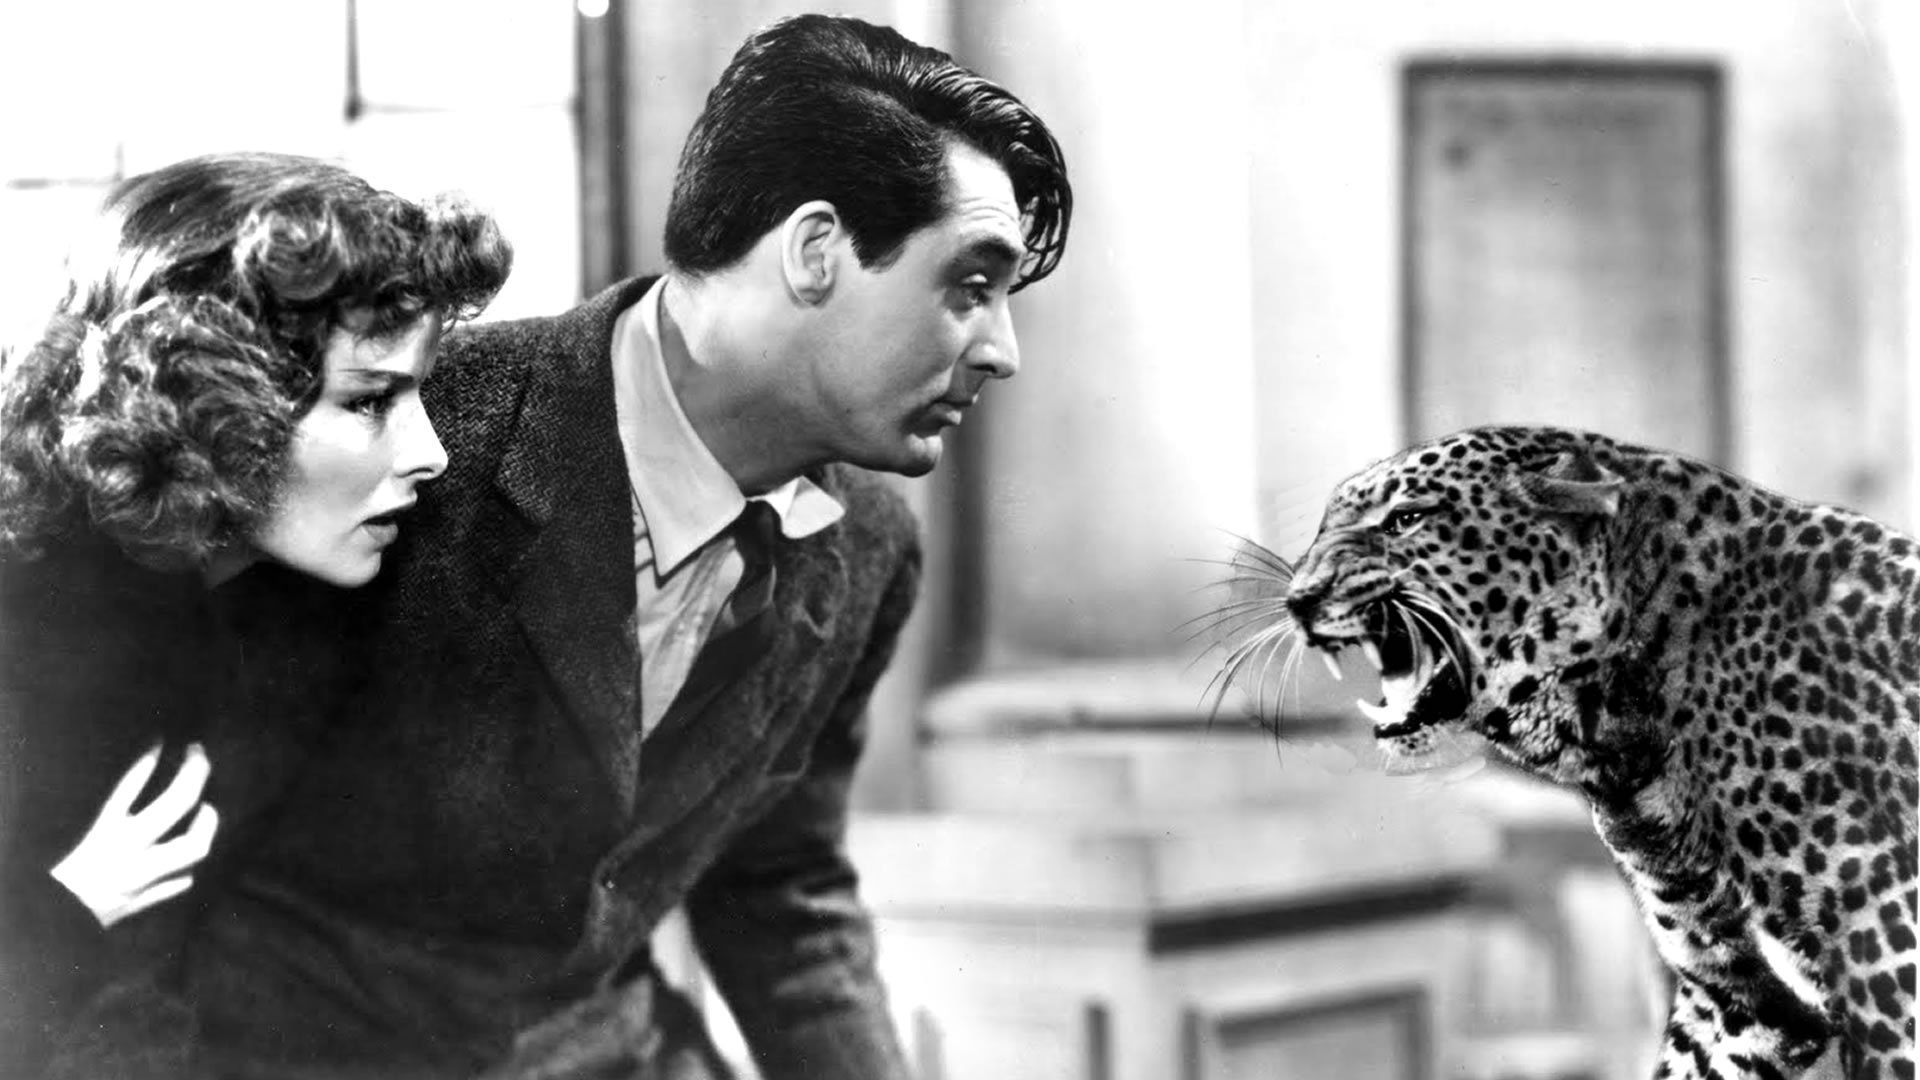 #55) Bringing Up Baby - (1938 - dir. Howard Hawks)